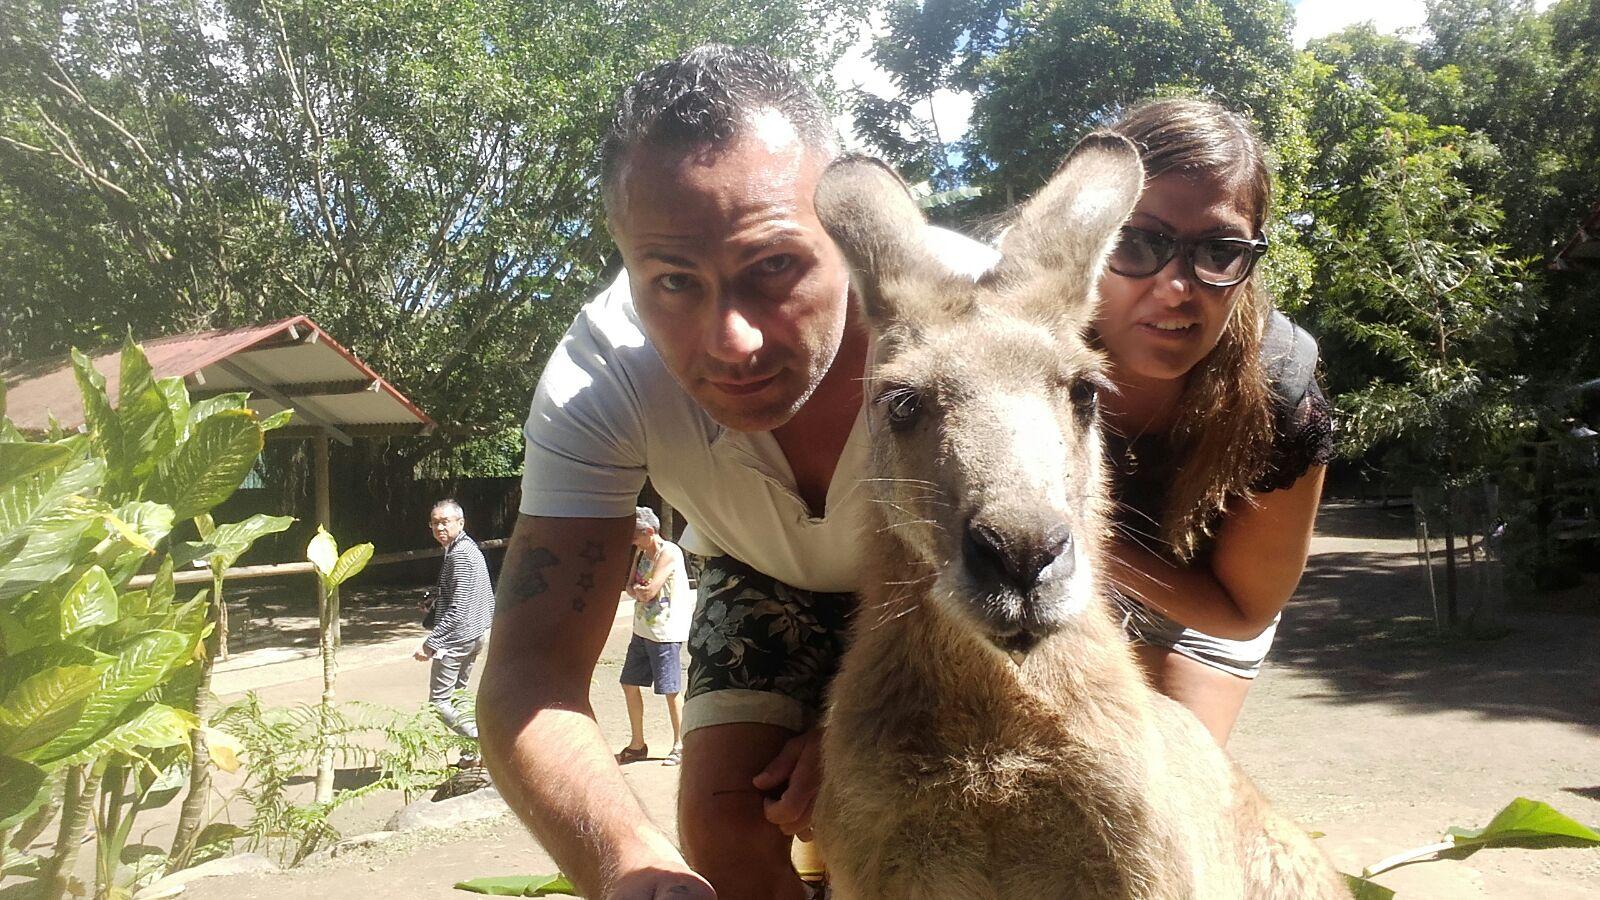 Koala Gardens Queensland, SELFIE CON CANGURO